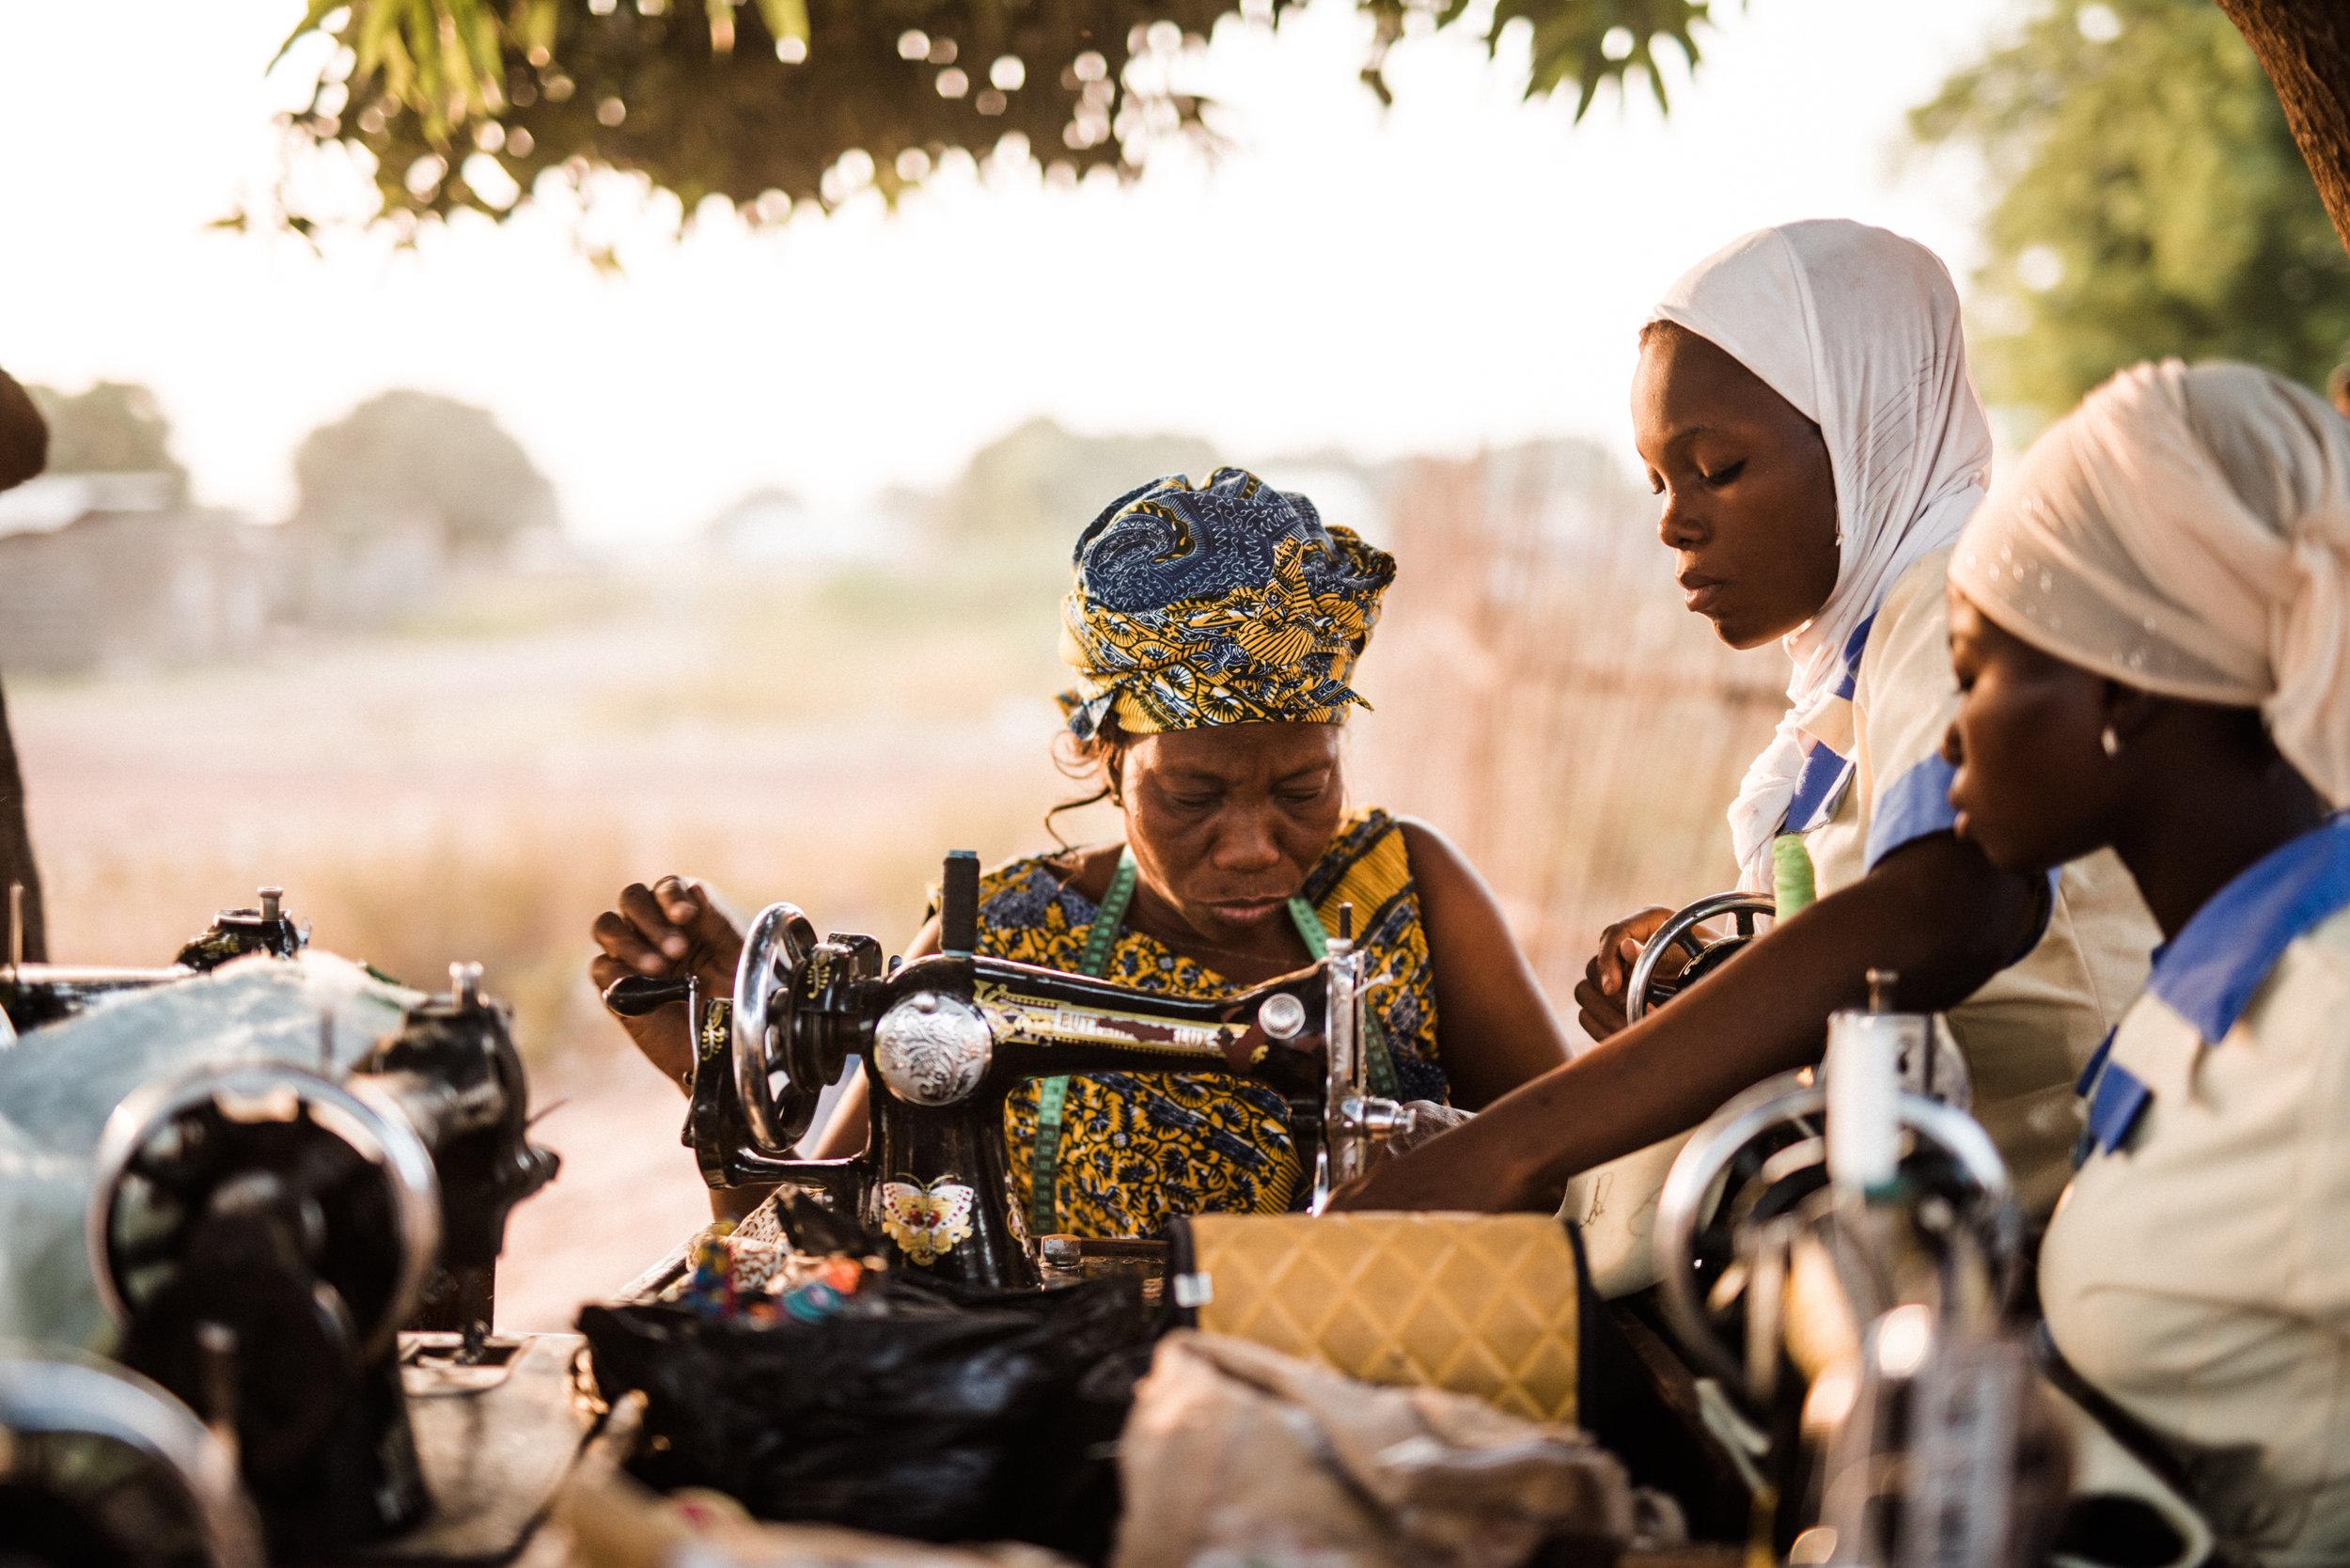 TaraShupe_HumanitarianPhotographer_Woman_Photographer_National_Geographic_Ghana_Women_009.jpg